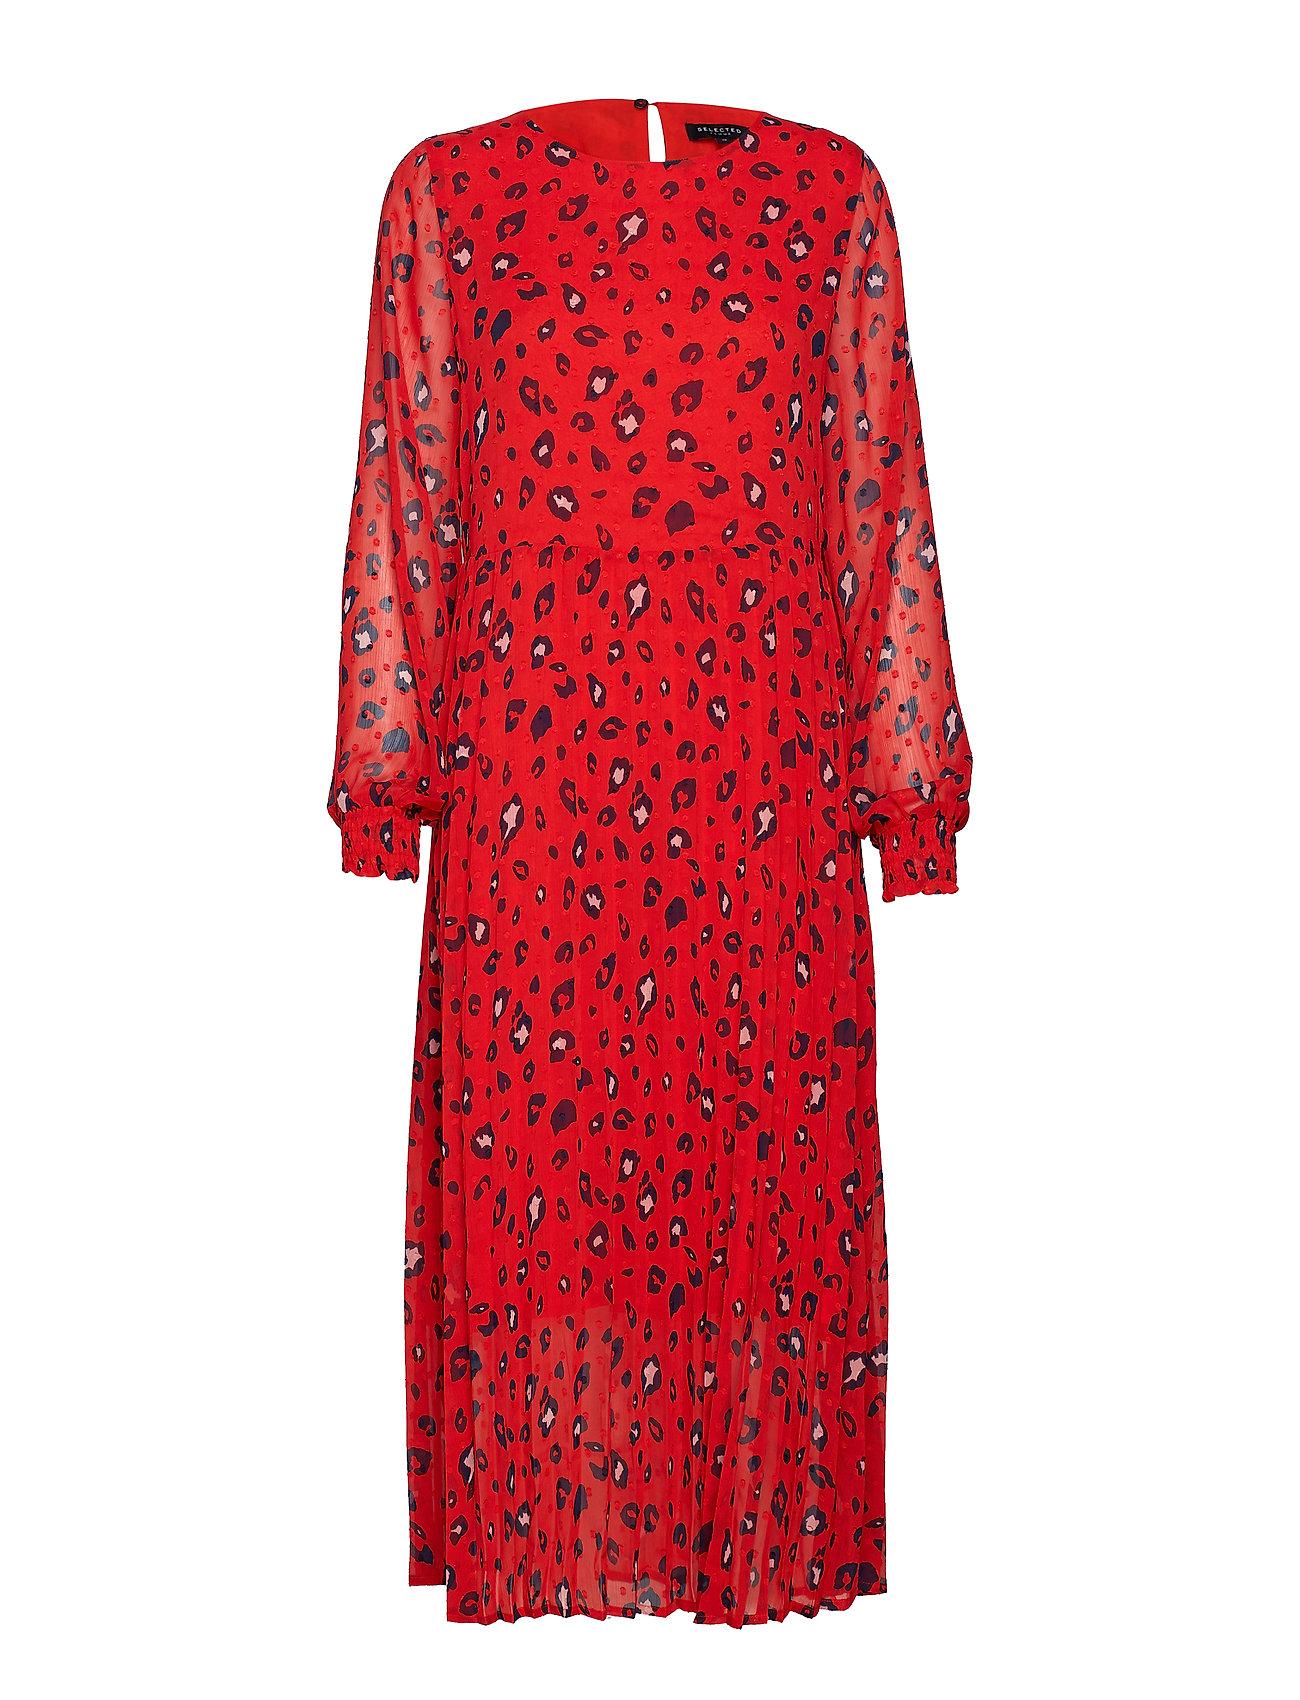 Selected Femme SLFBELLA LS PLISSE DRESS EX - TRUE RED